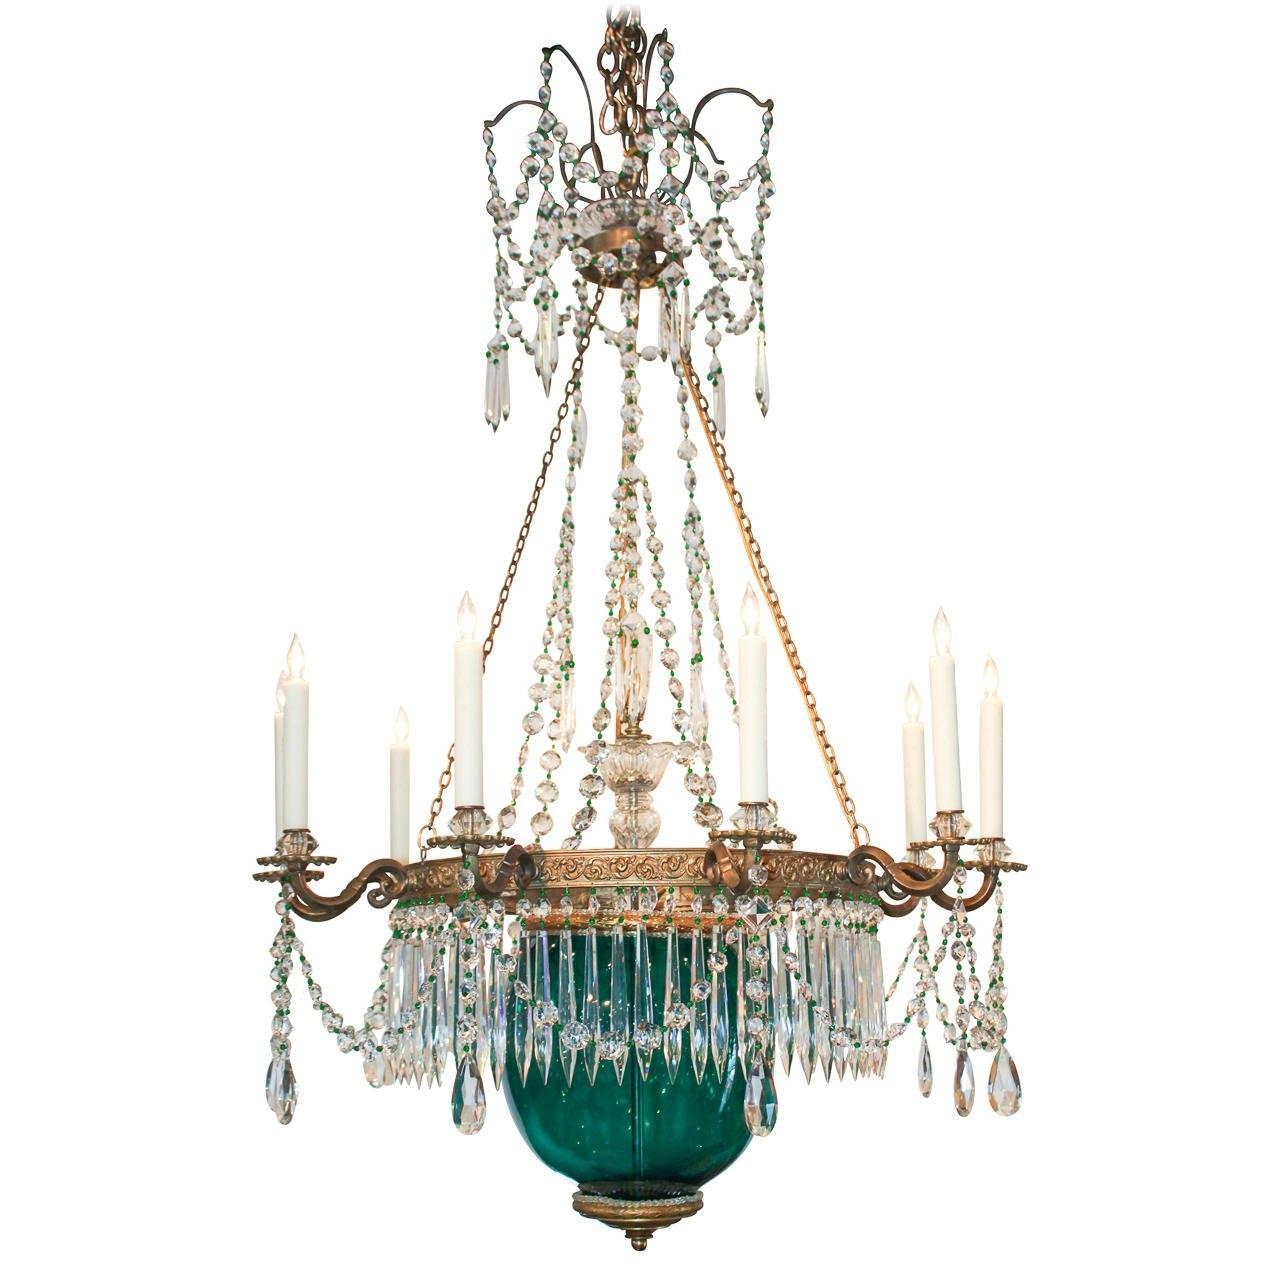 Chandelier Astonishing Colored Glass Chandelier Gypsy Chandeliers Pertaining To Gypsy Chandeliers (Image 9 of 25)